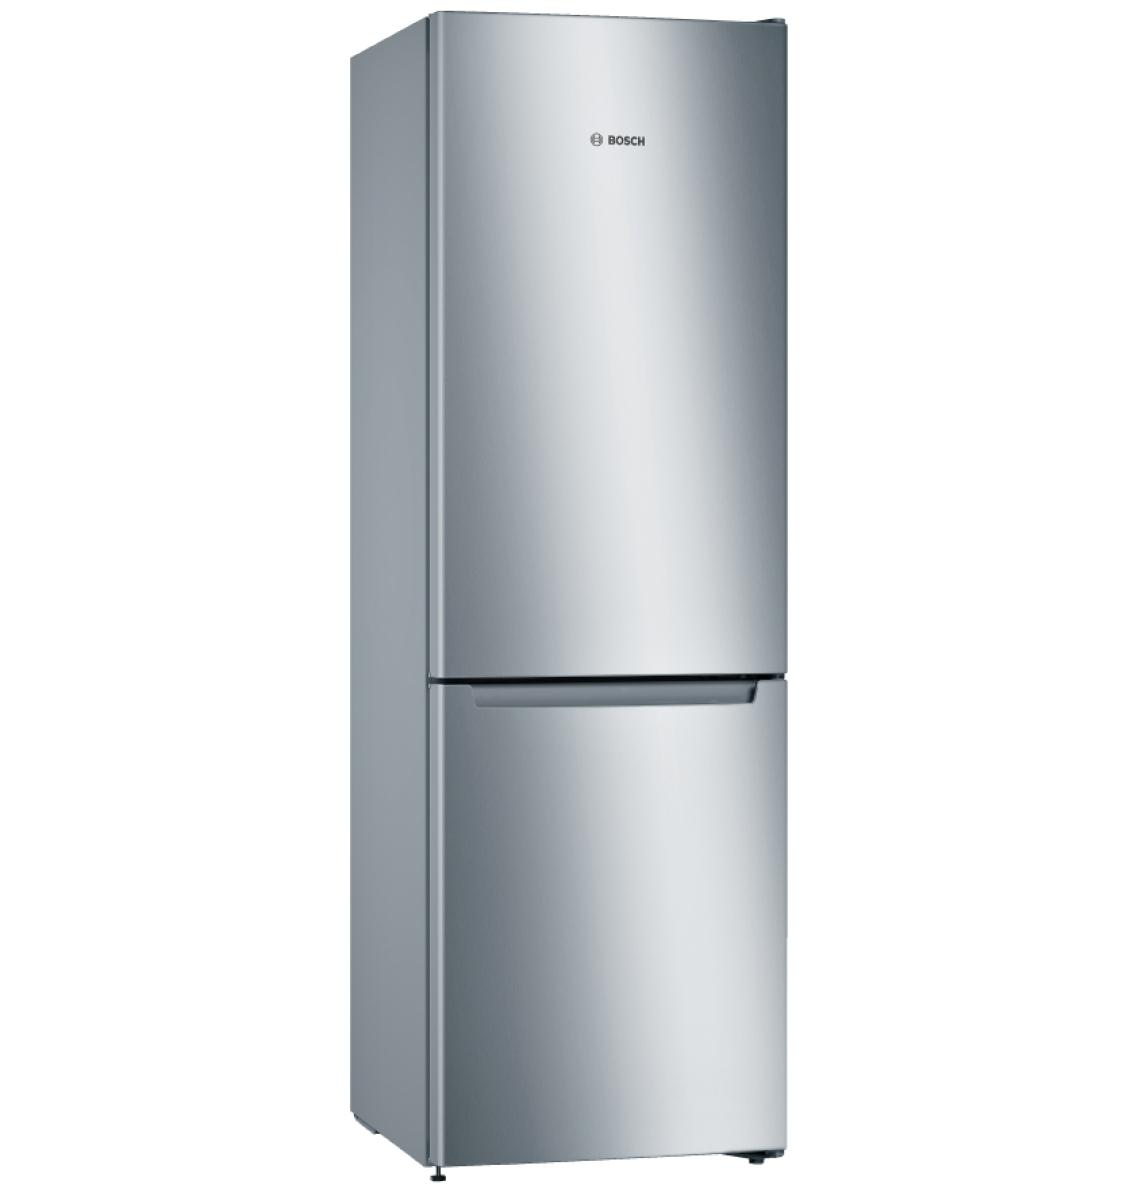 Bosch KGN36NLEA Stand Kühl-Gefrier-KombiNoFrostLEDEdelstahl-Optik